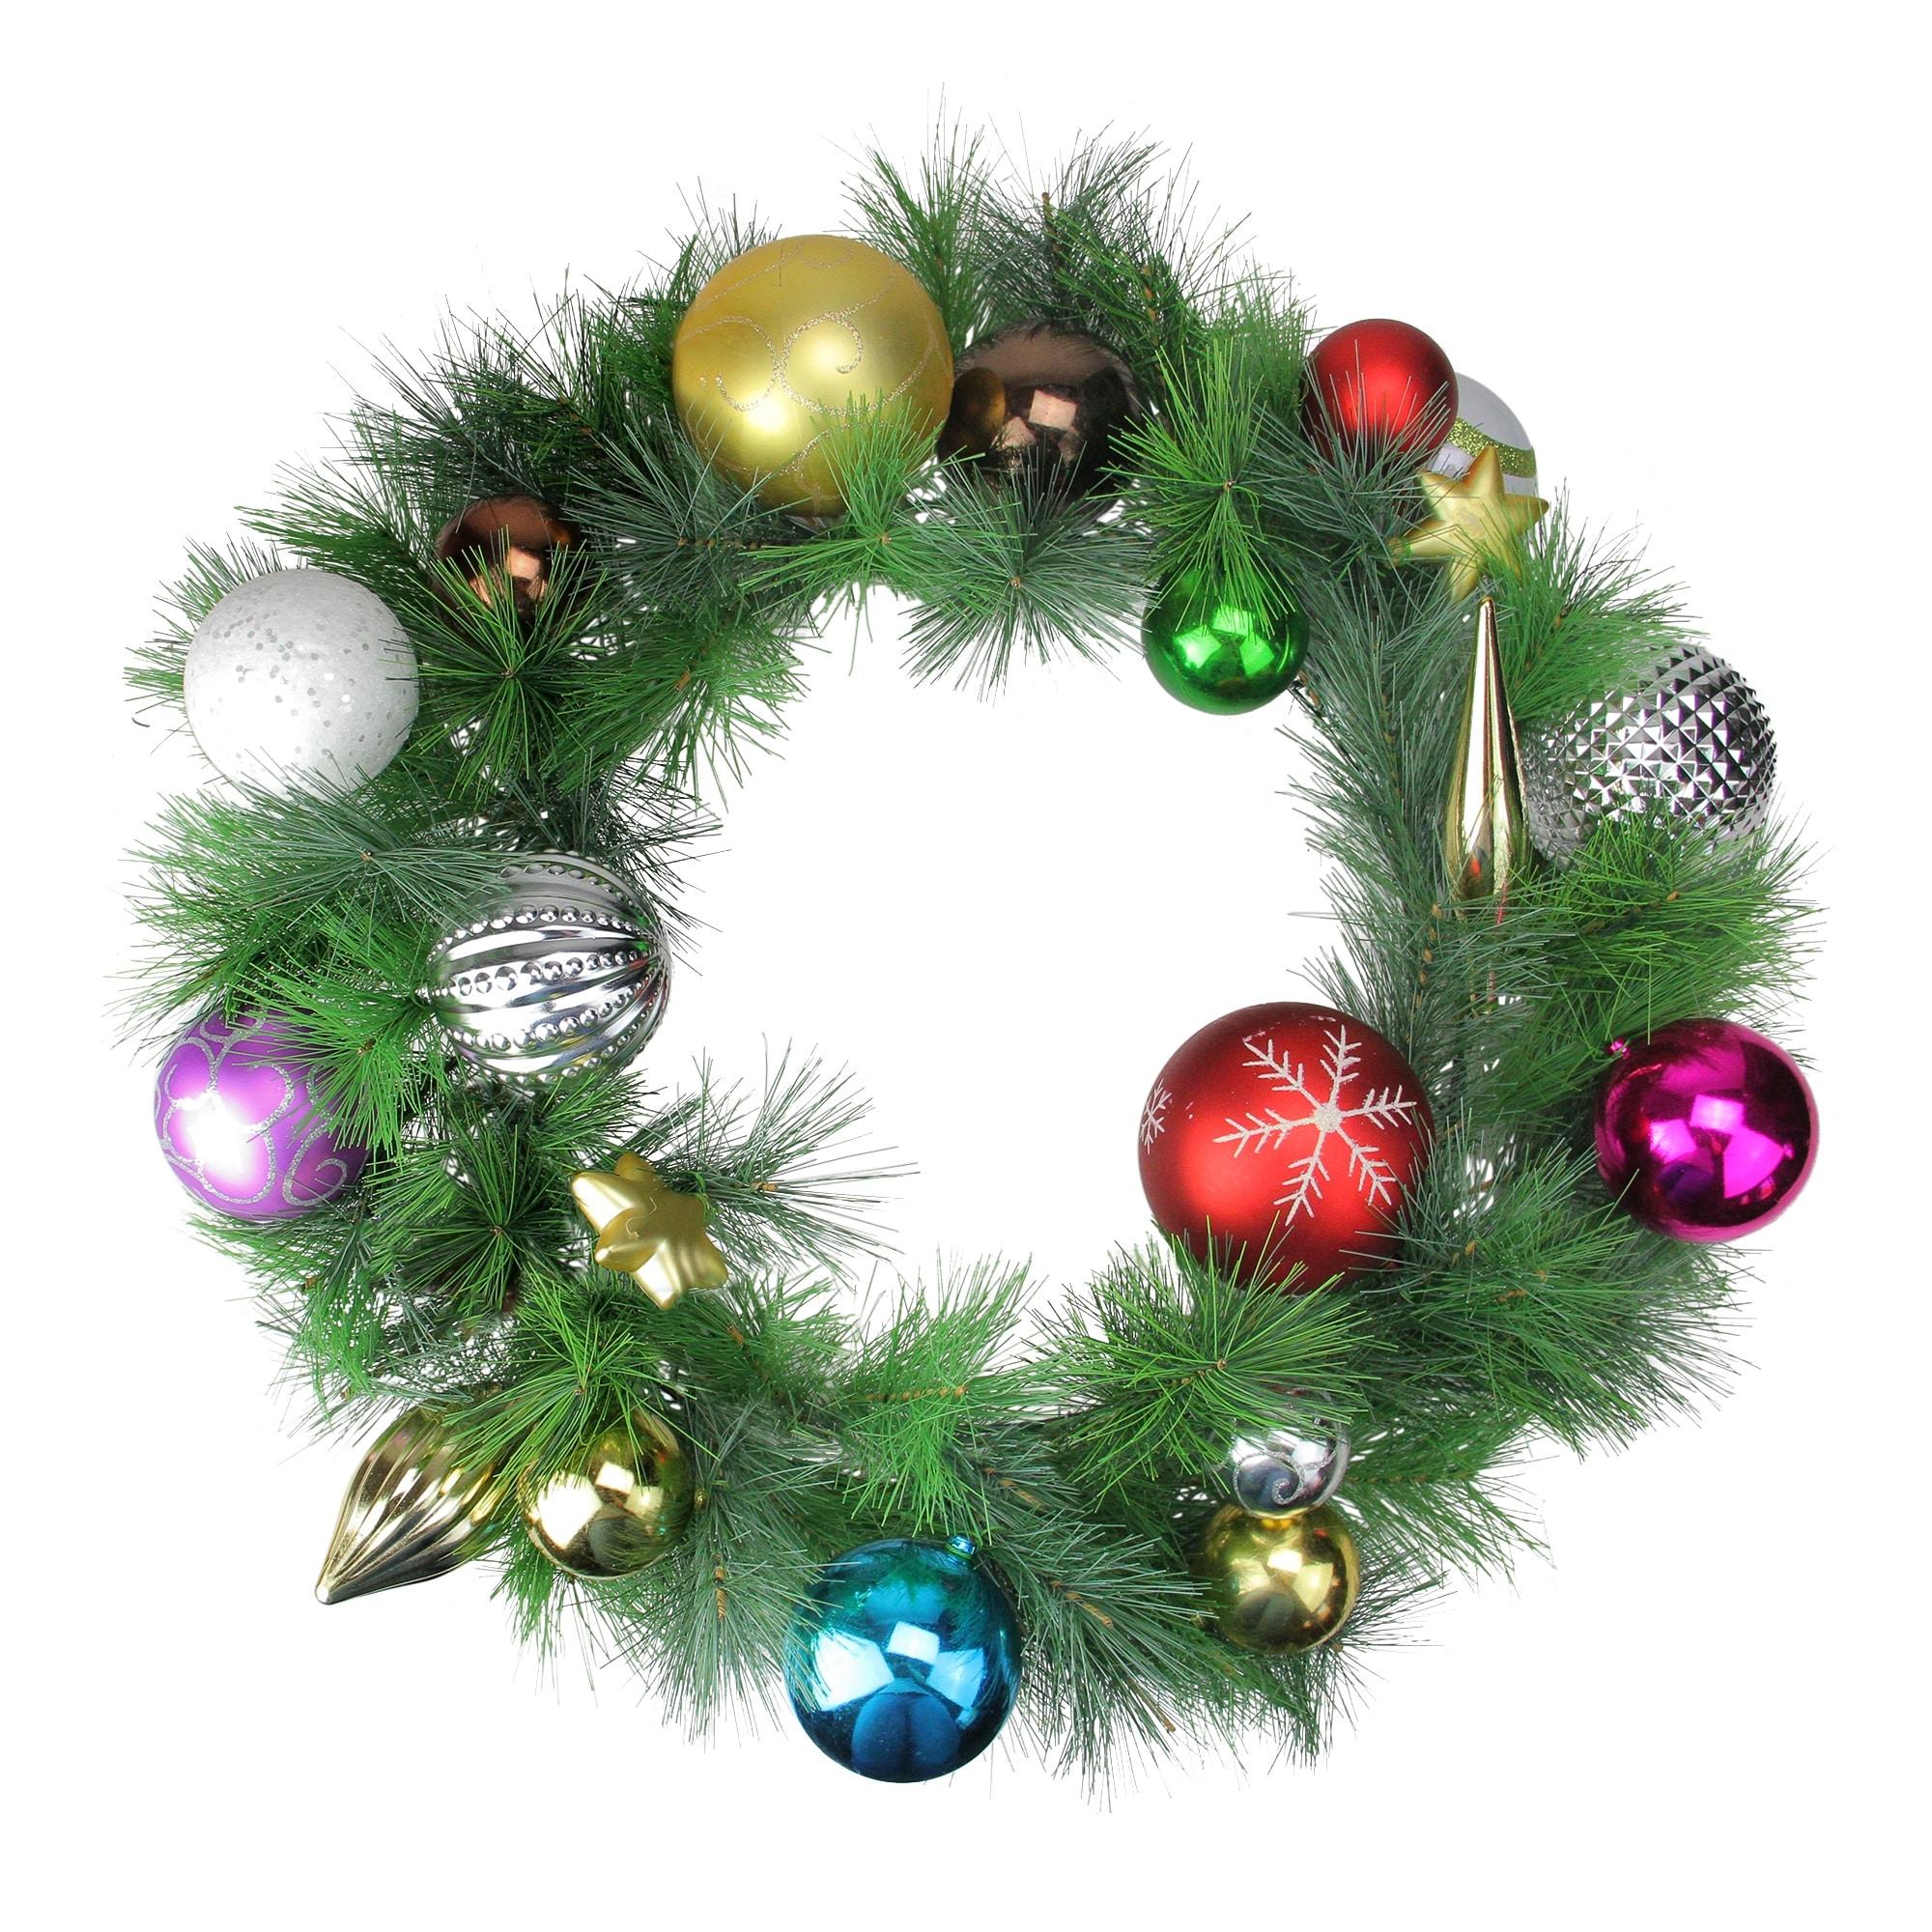 24 Multi Color Ornament Long Needle Pine Artificial Christmas Wreath Unlit Multi Overstock 16542217